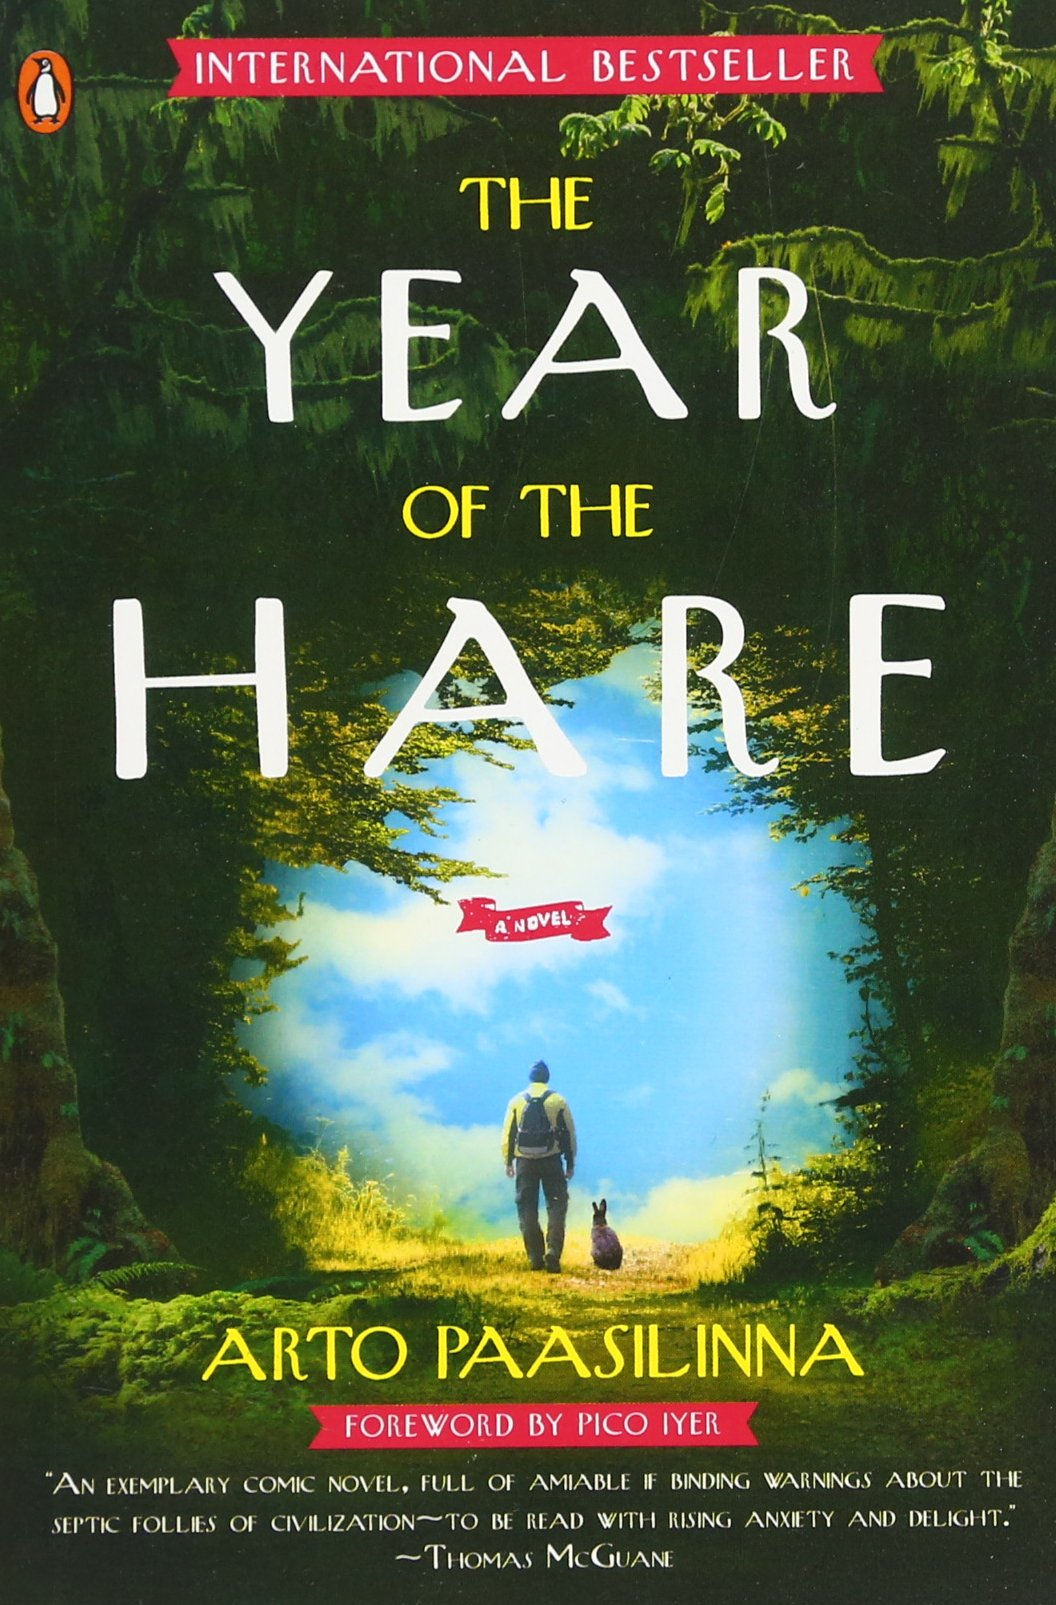 Year of the Hare -- Arto Paasilinna